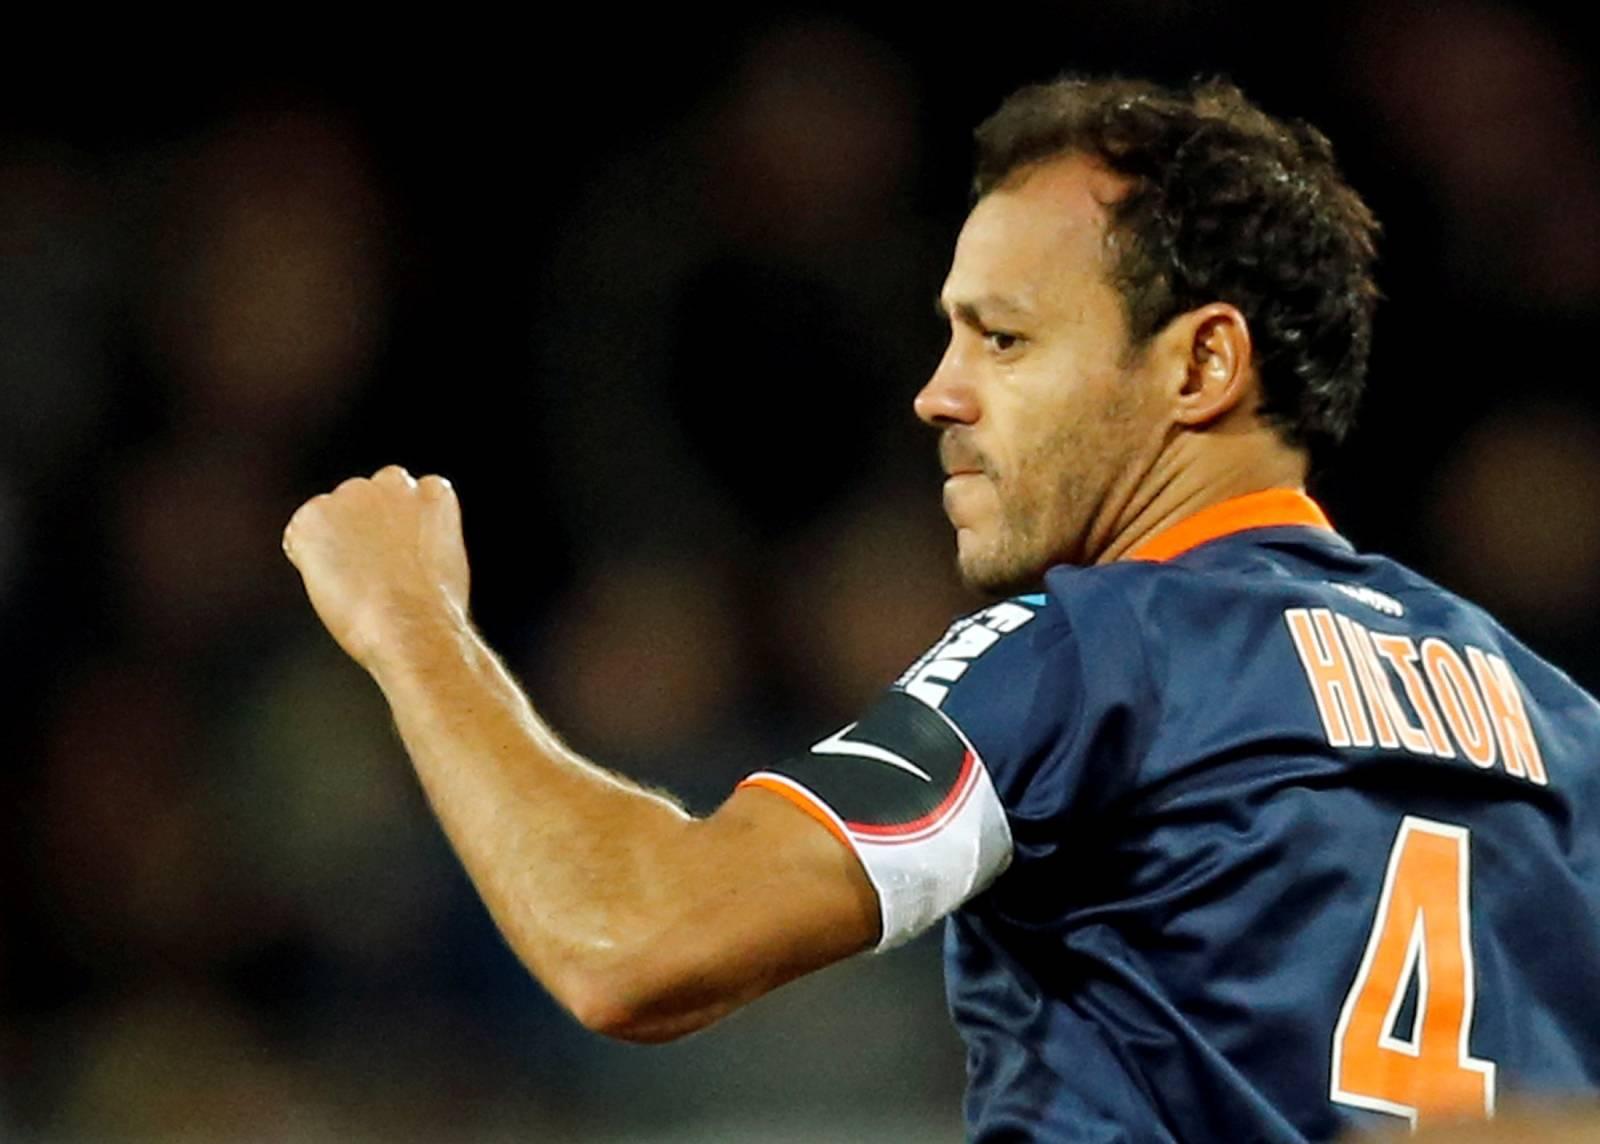 FILE PHOTO: Montpellier's Vitorino Hilton reacts after scoring v Monaco